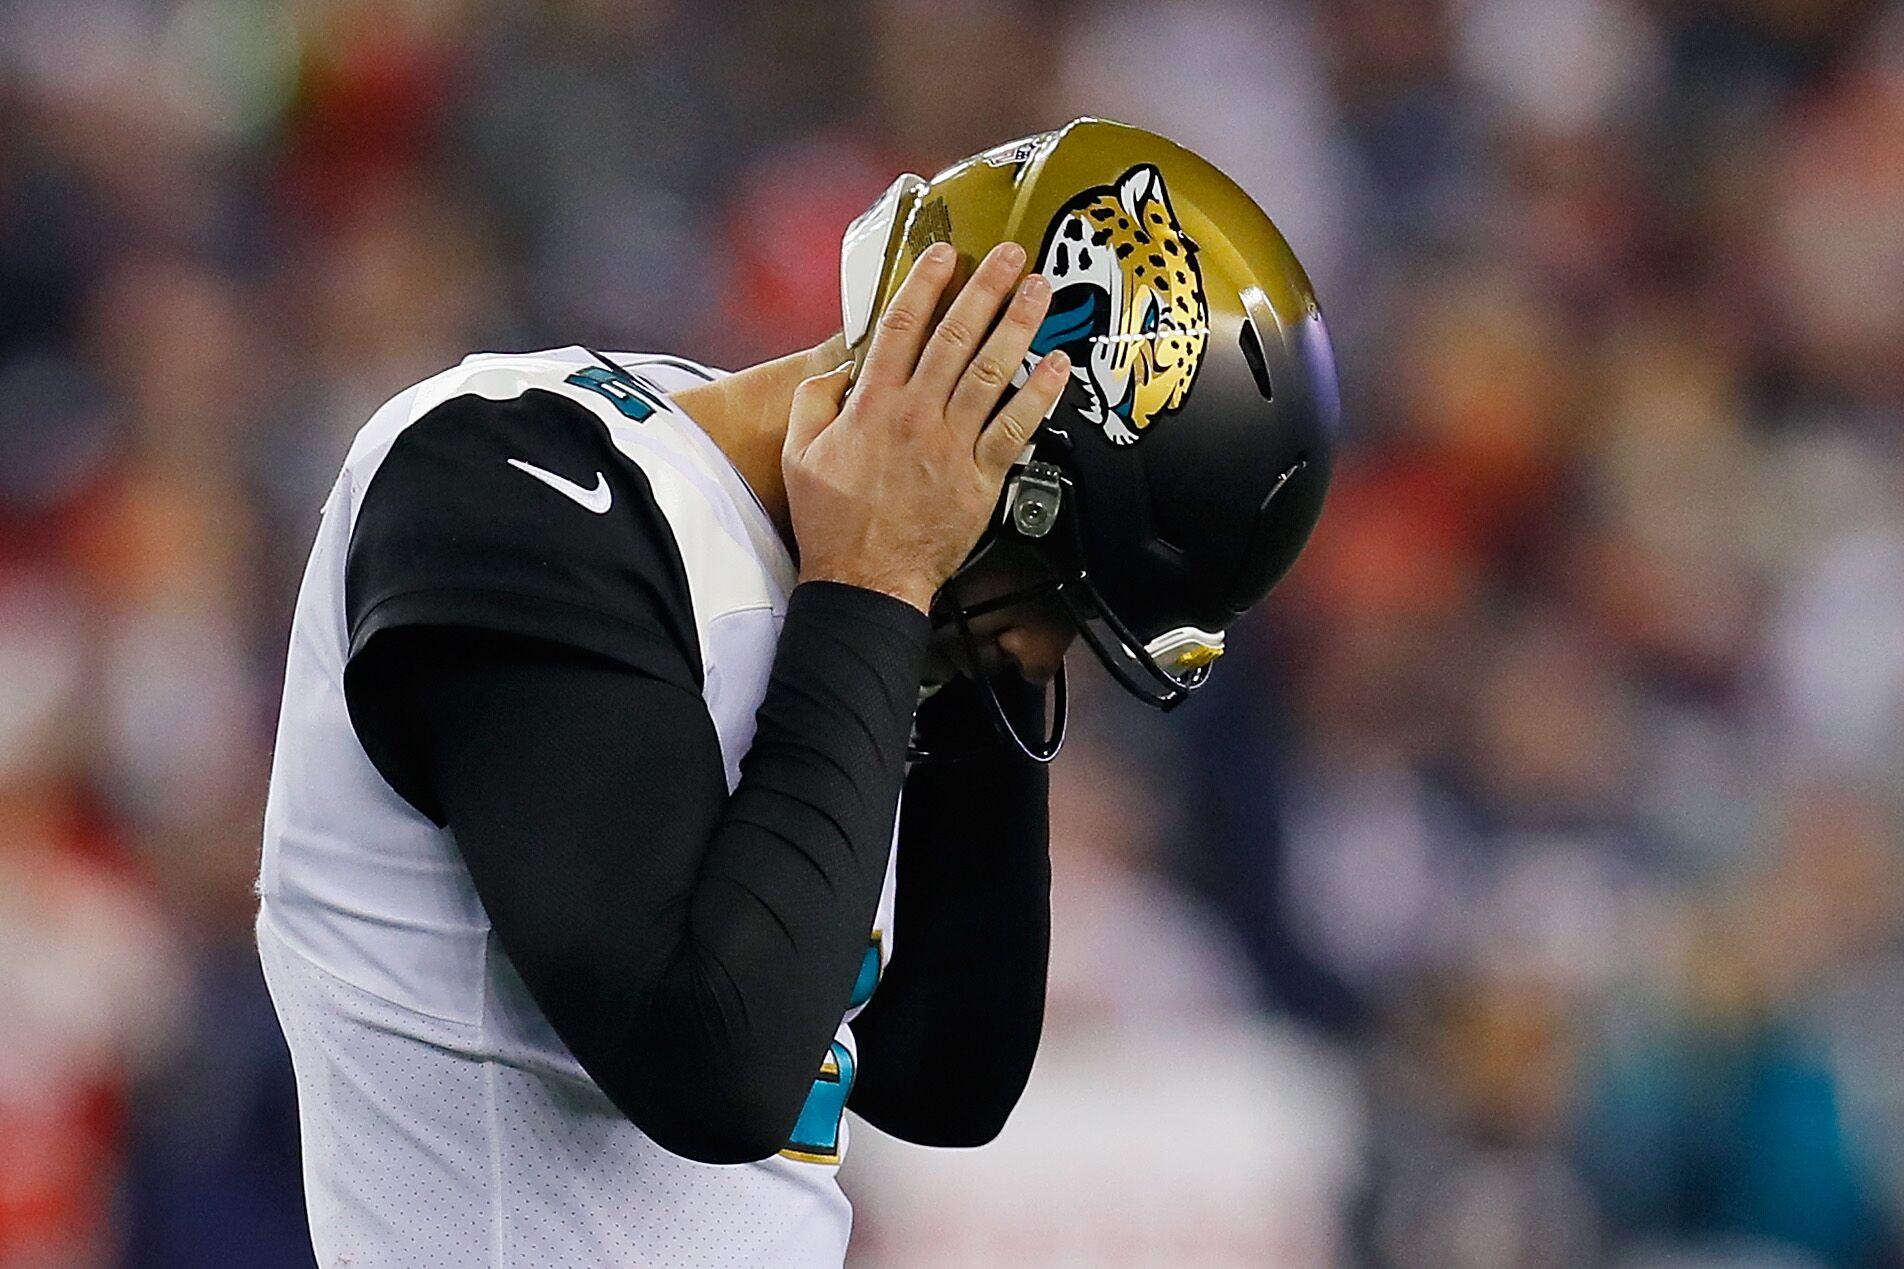 NFL Offseason 2019: Predicting Week 1 starting quarterbacks for needy teams